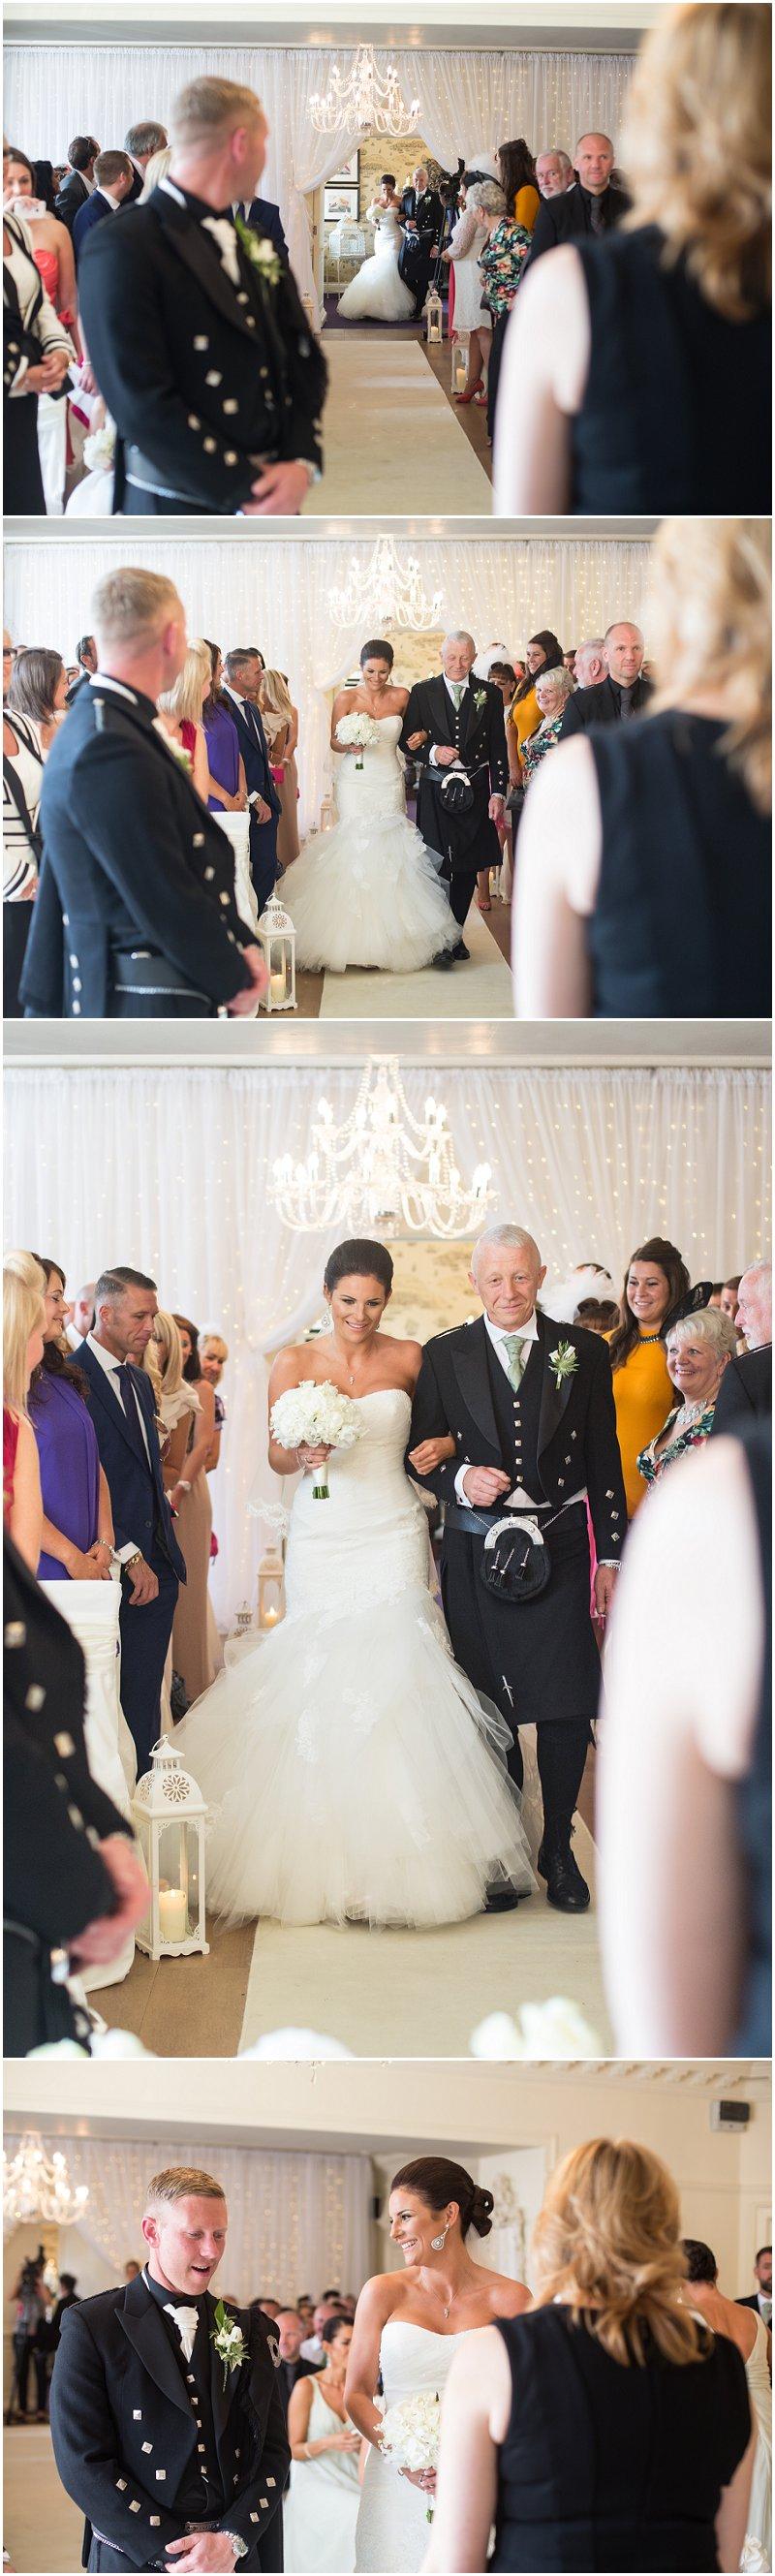 Bride walking down aisle at Eaves Hall Lancashire